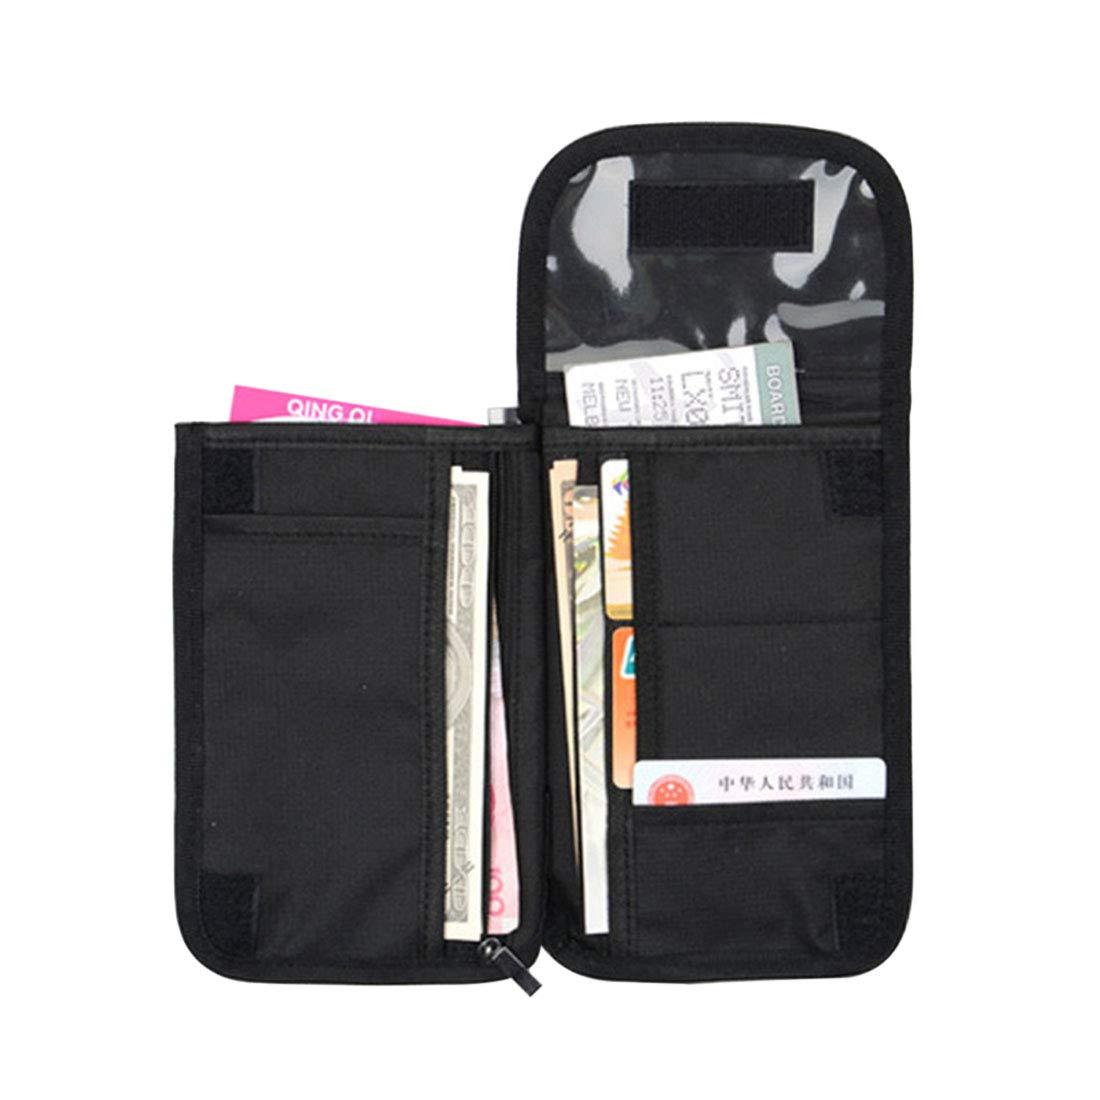 Jiyaru Passport Wallet Organizer Zippered Holder with Shoulder Strap Document Bag for Travel Black